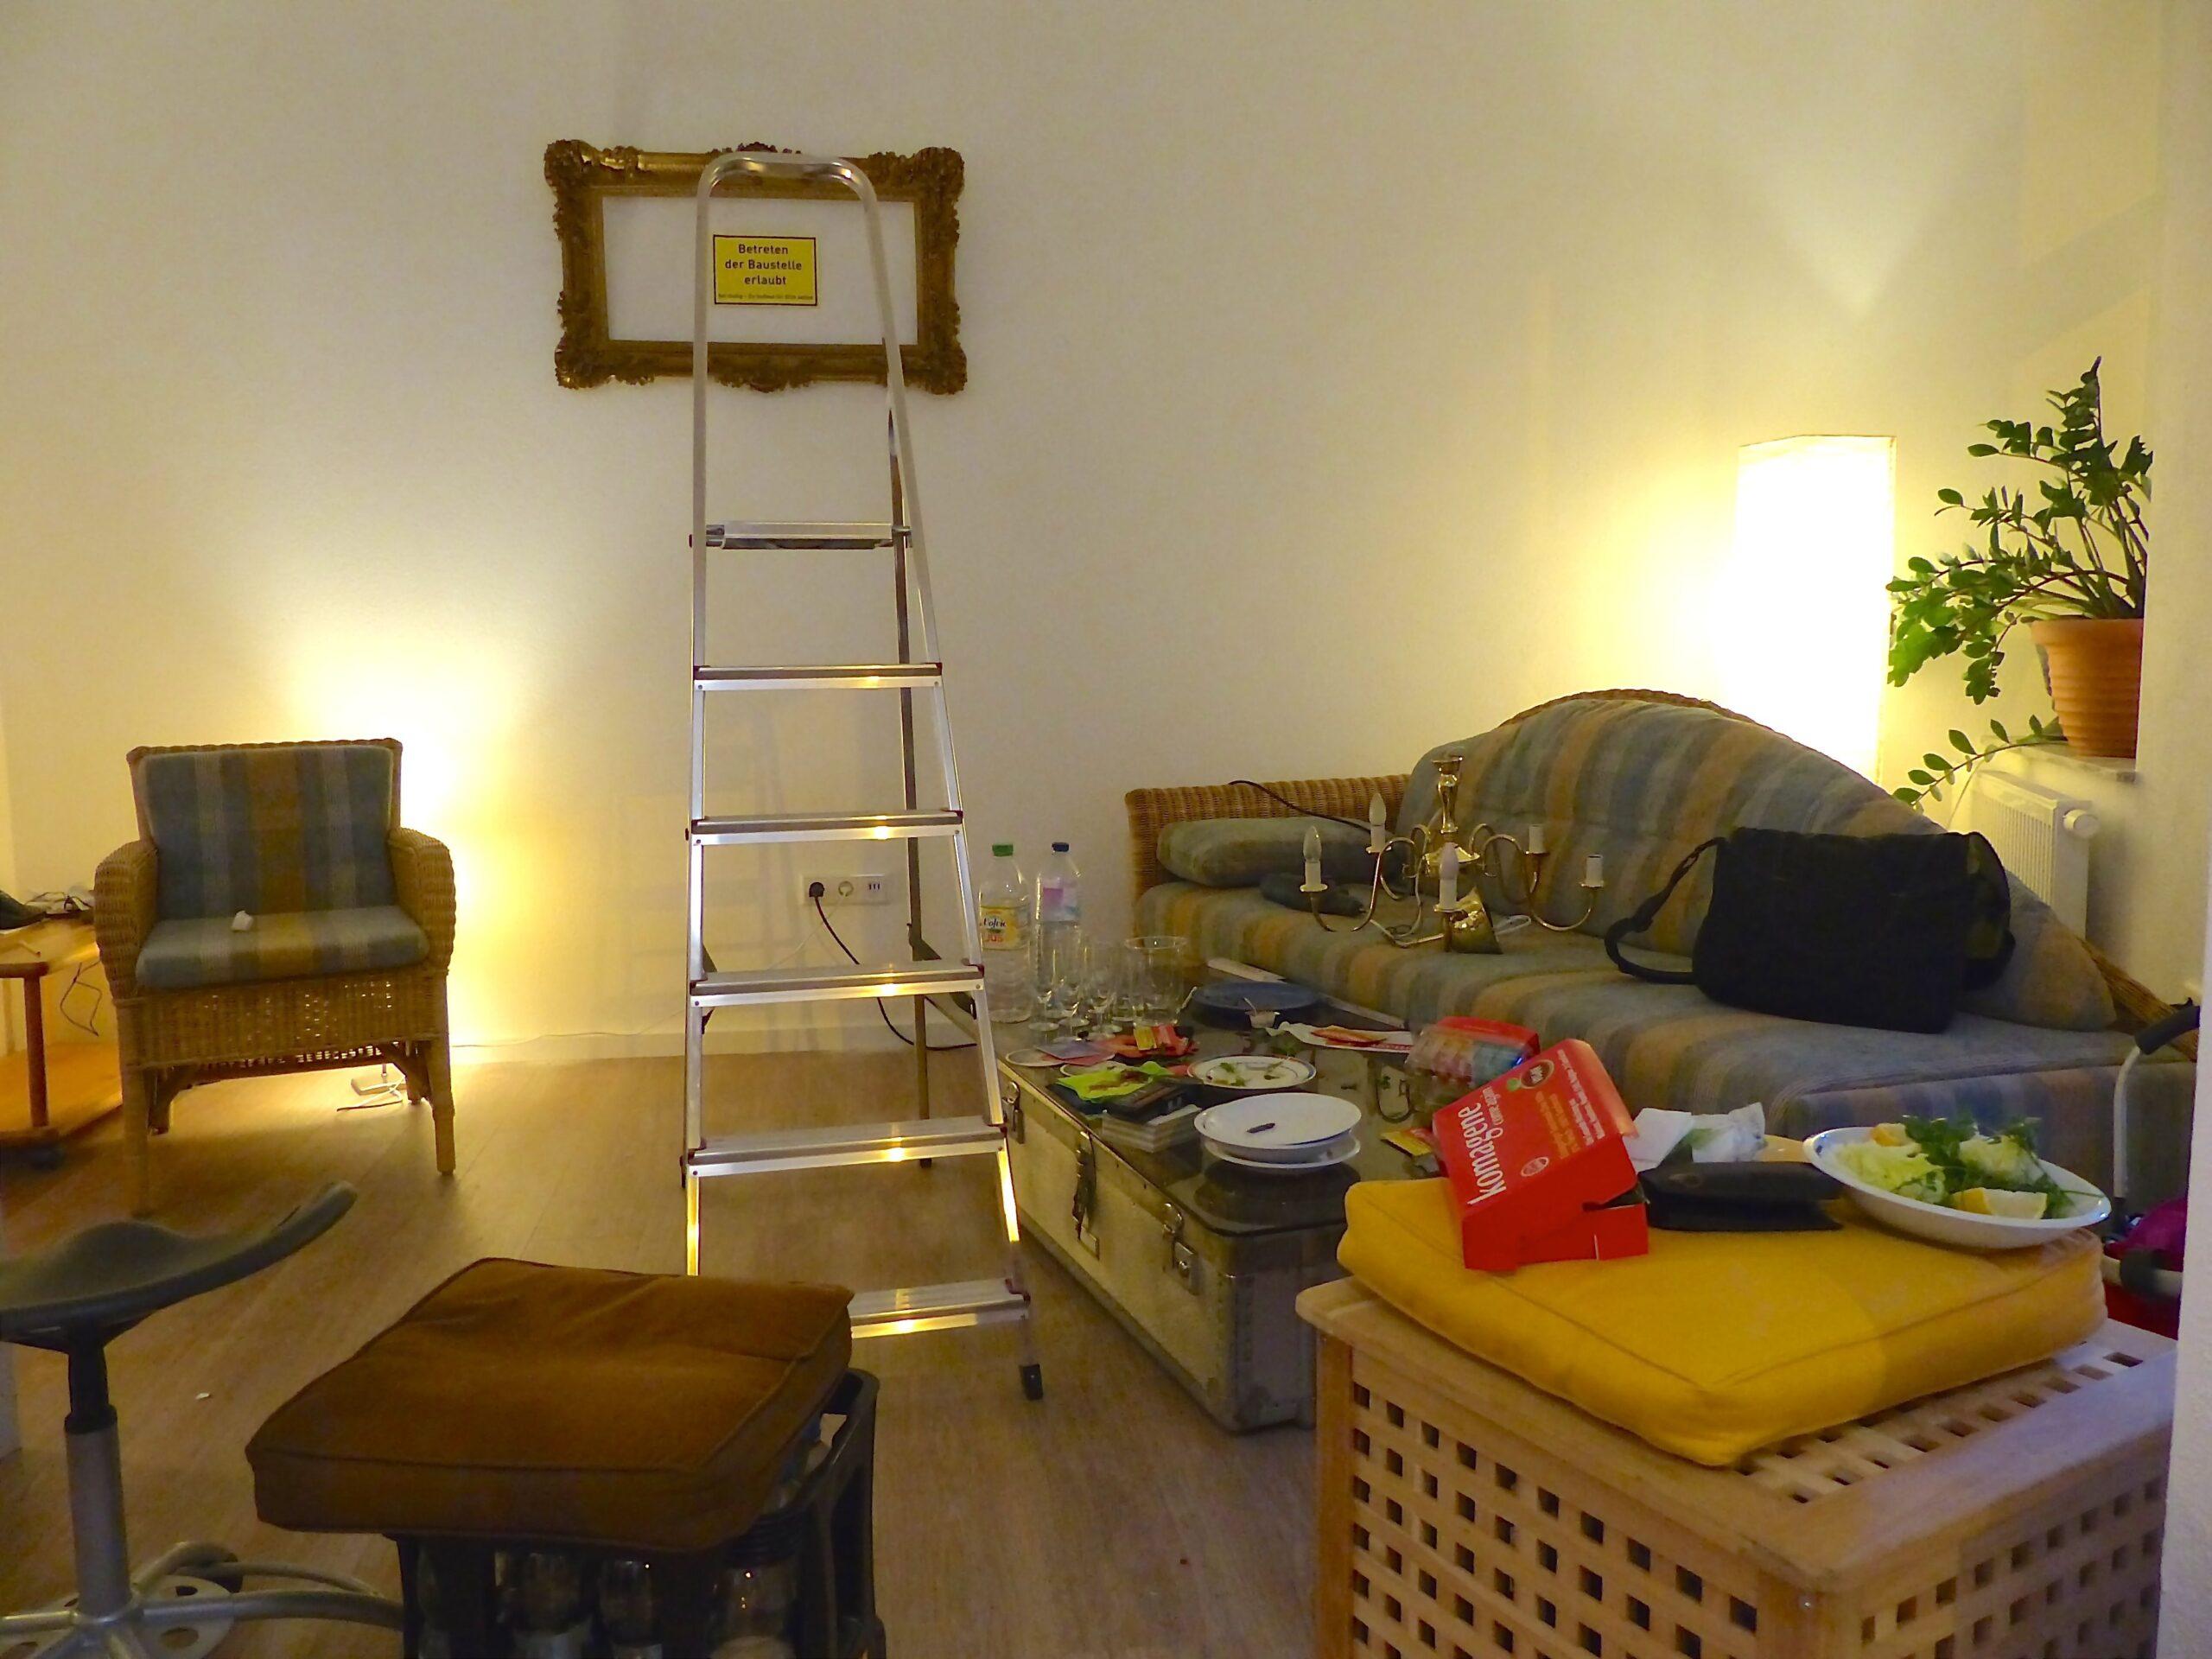 Full Size of Wohnzimmer Led Lampen Teppich Wandtattoos Schrank Gardine Tapete Sessel Board Wandtattoo Wohnzimmer Wohnzimmer Dekorieren